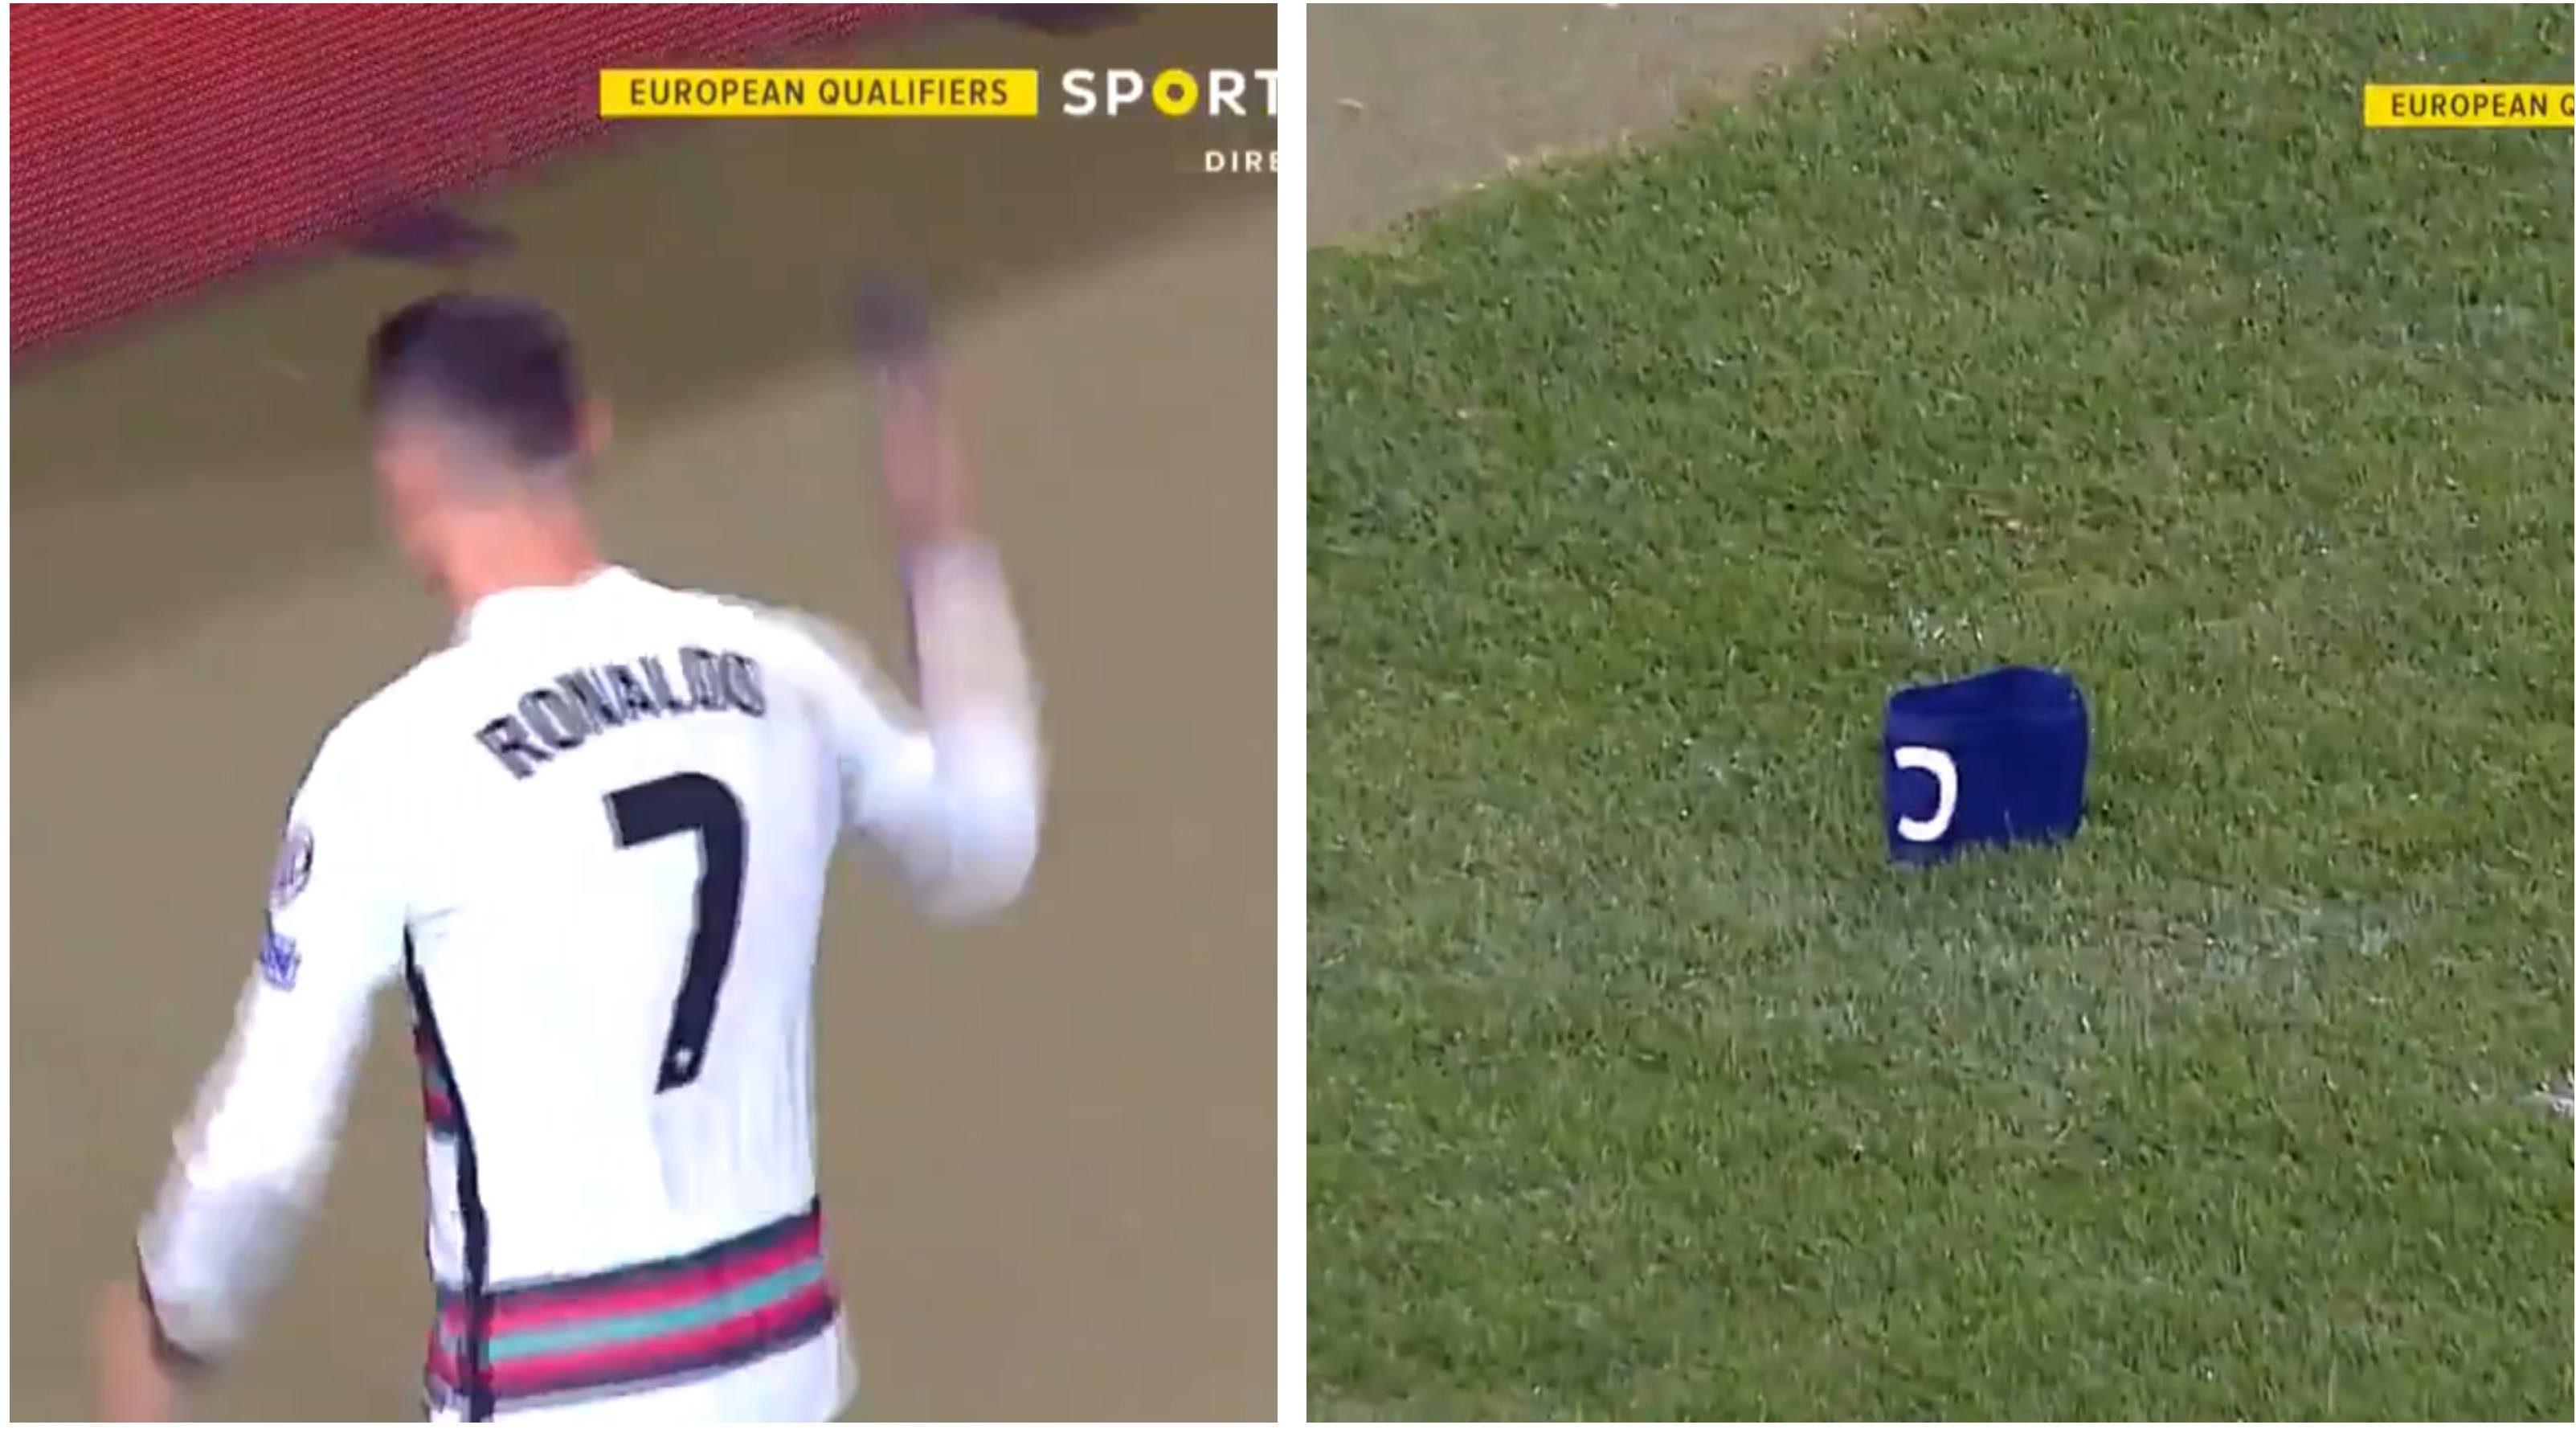 Cristiano Ronaldo armband